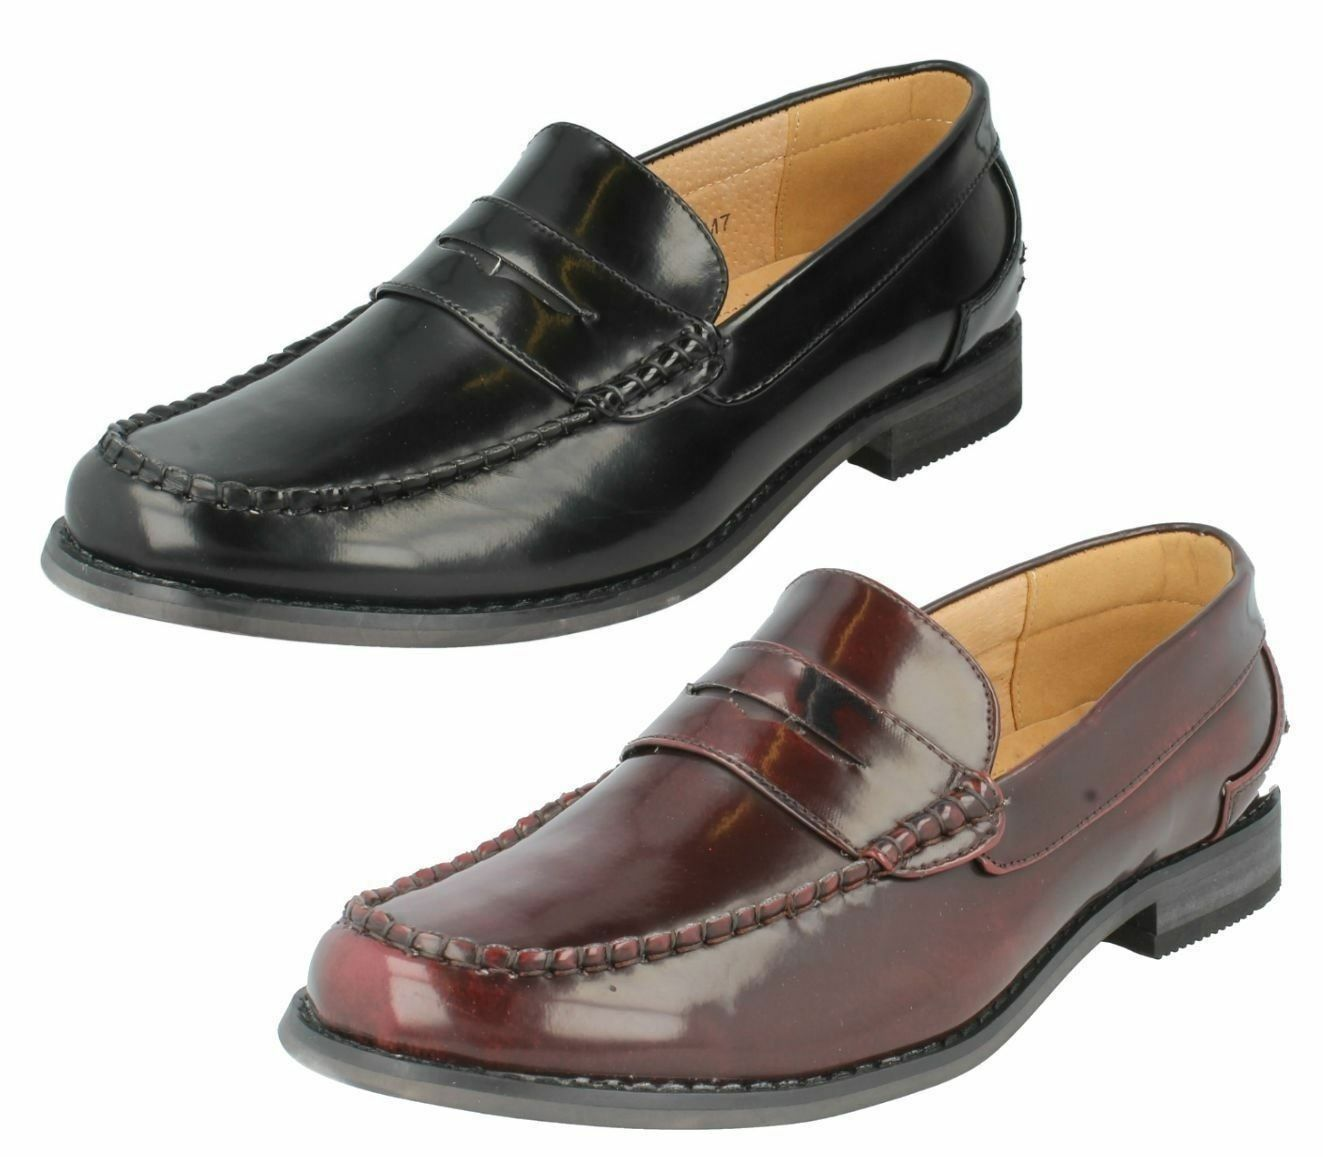 Mens A1118 moccasins hi shine Black or Burgundy moccasins A1118 shoes by MAVERICK 6067cb